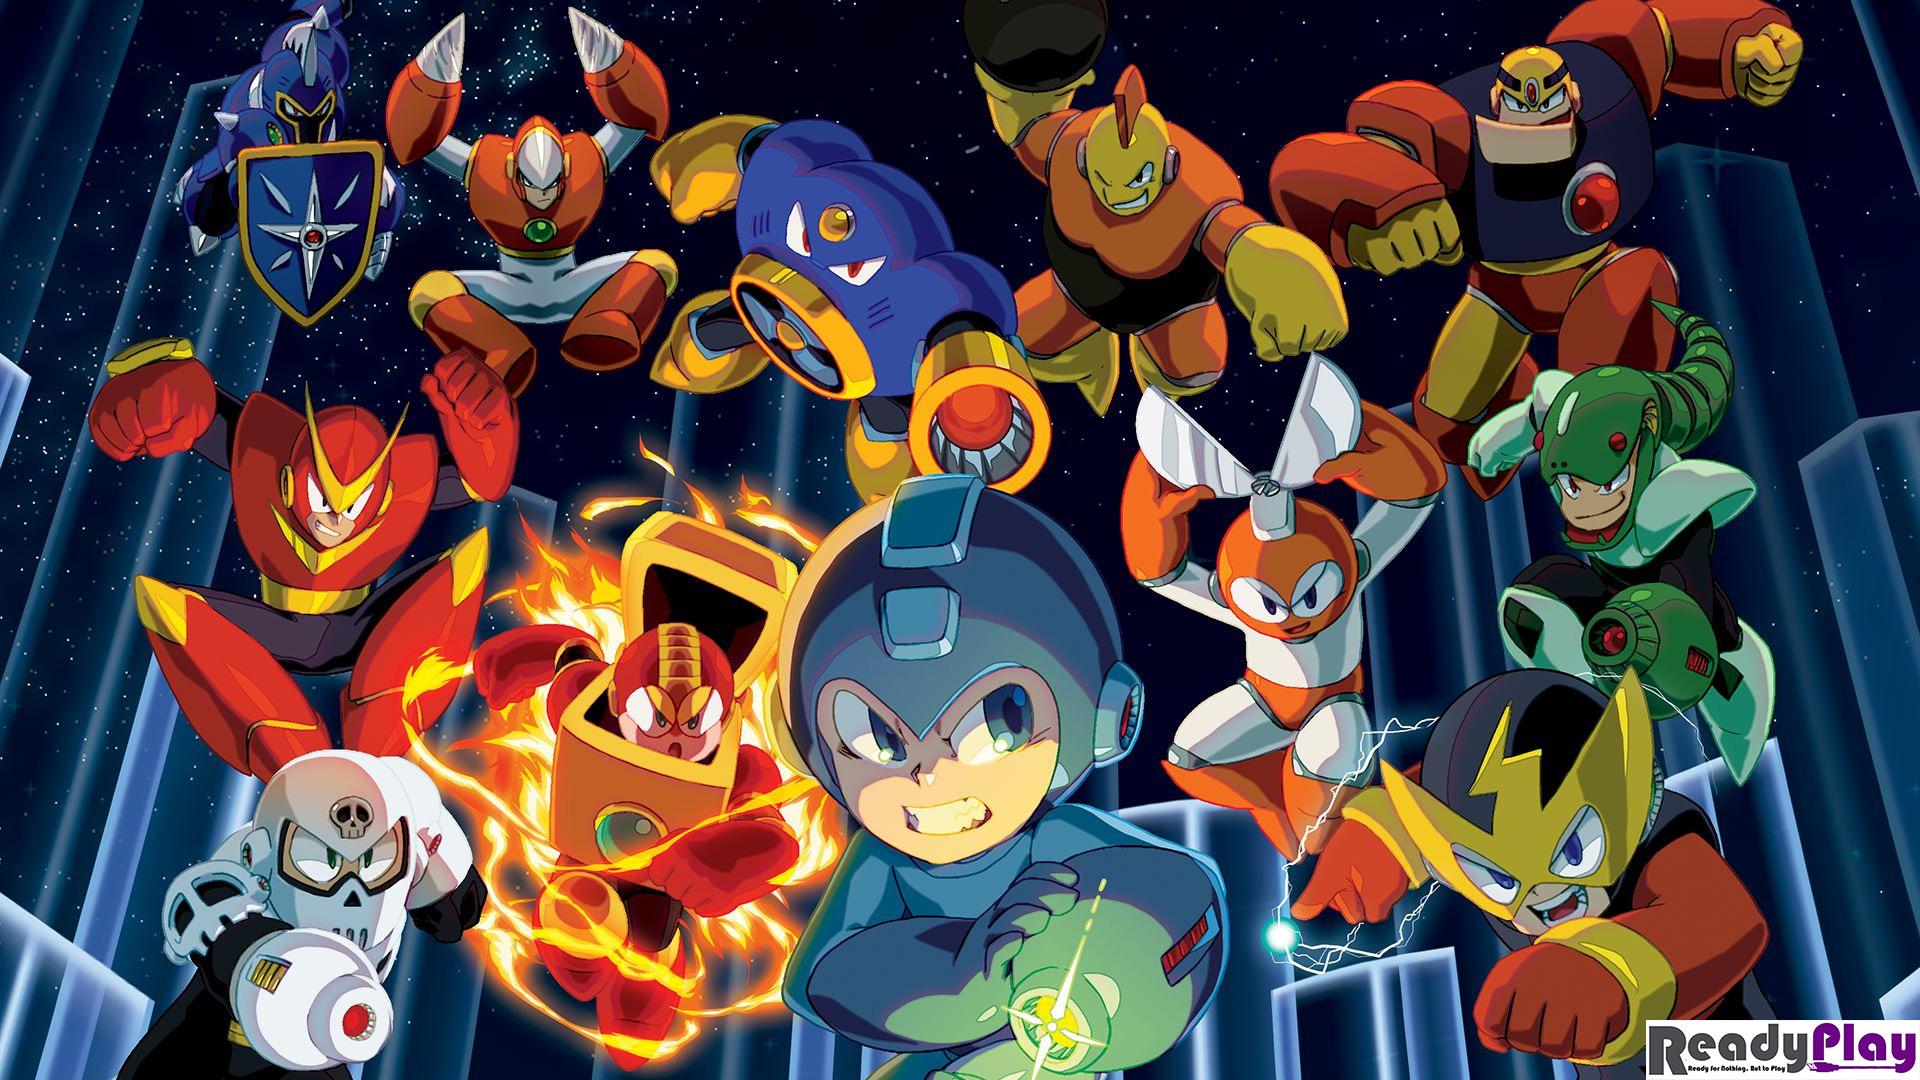 Mega Man Videospiele